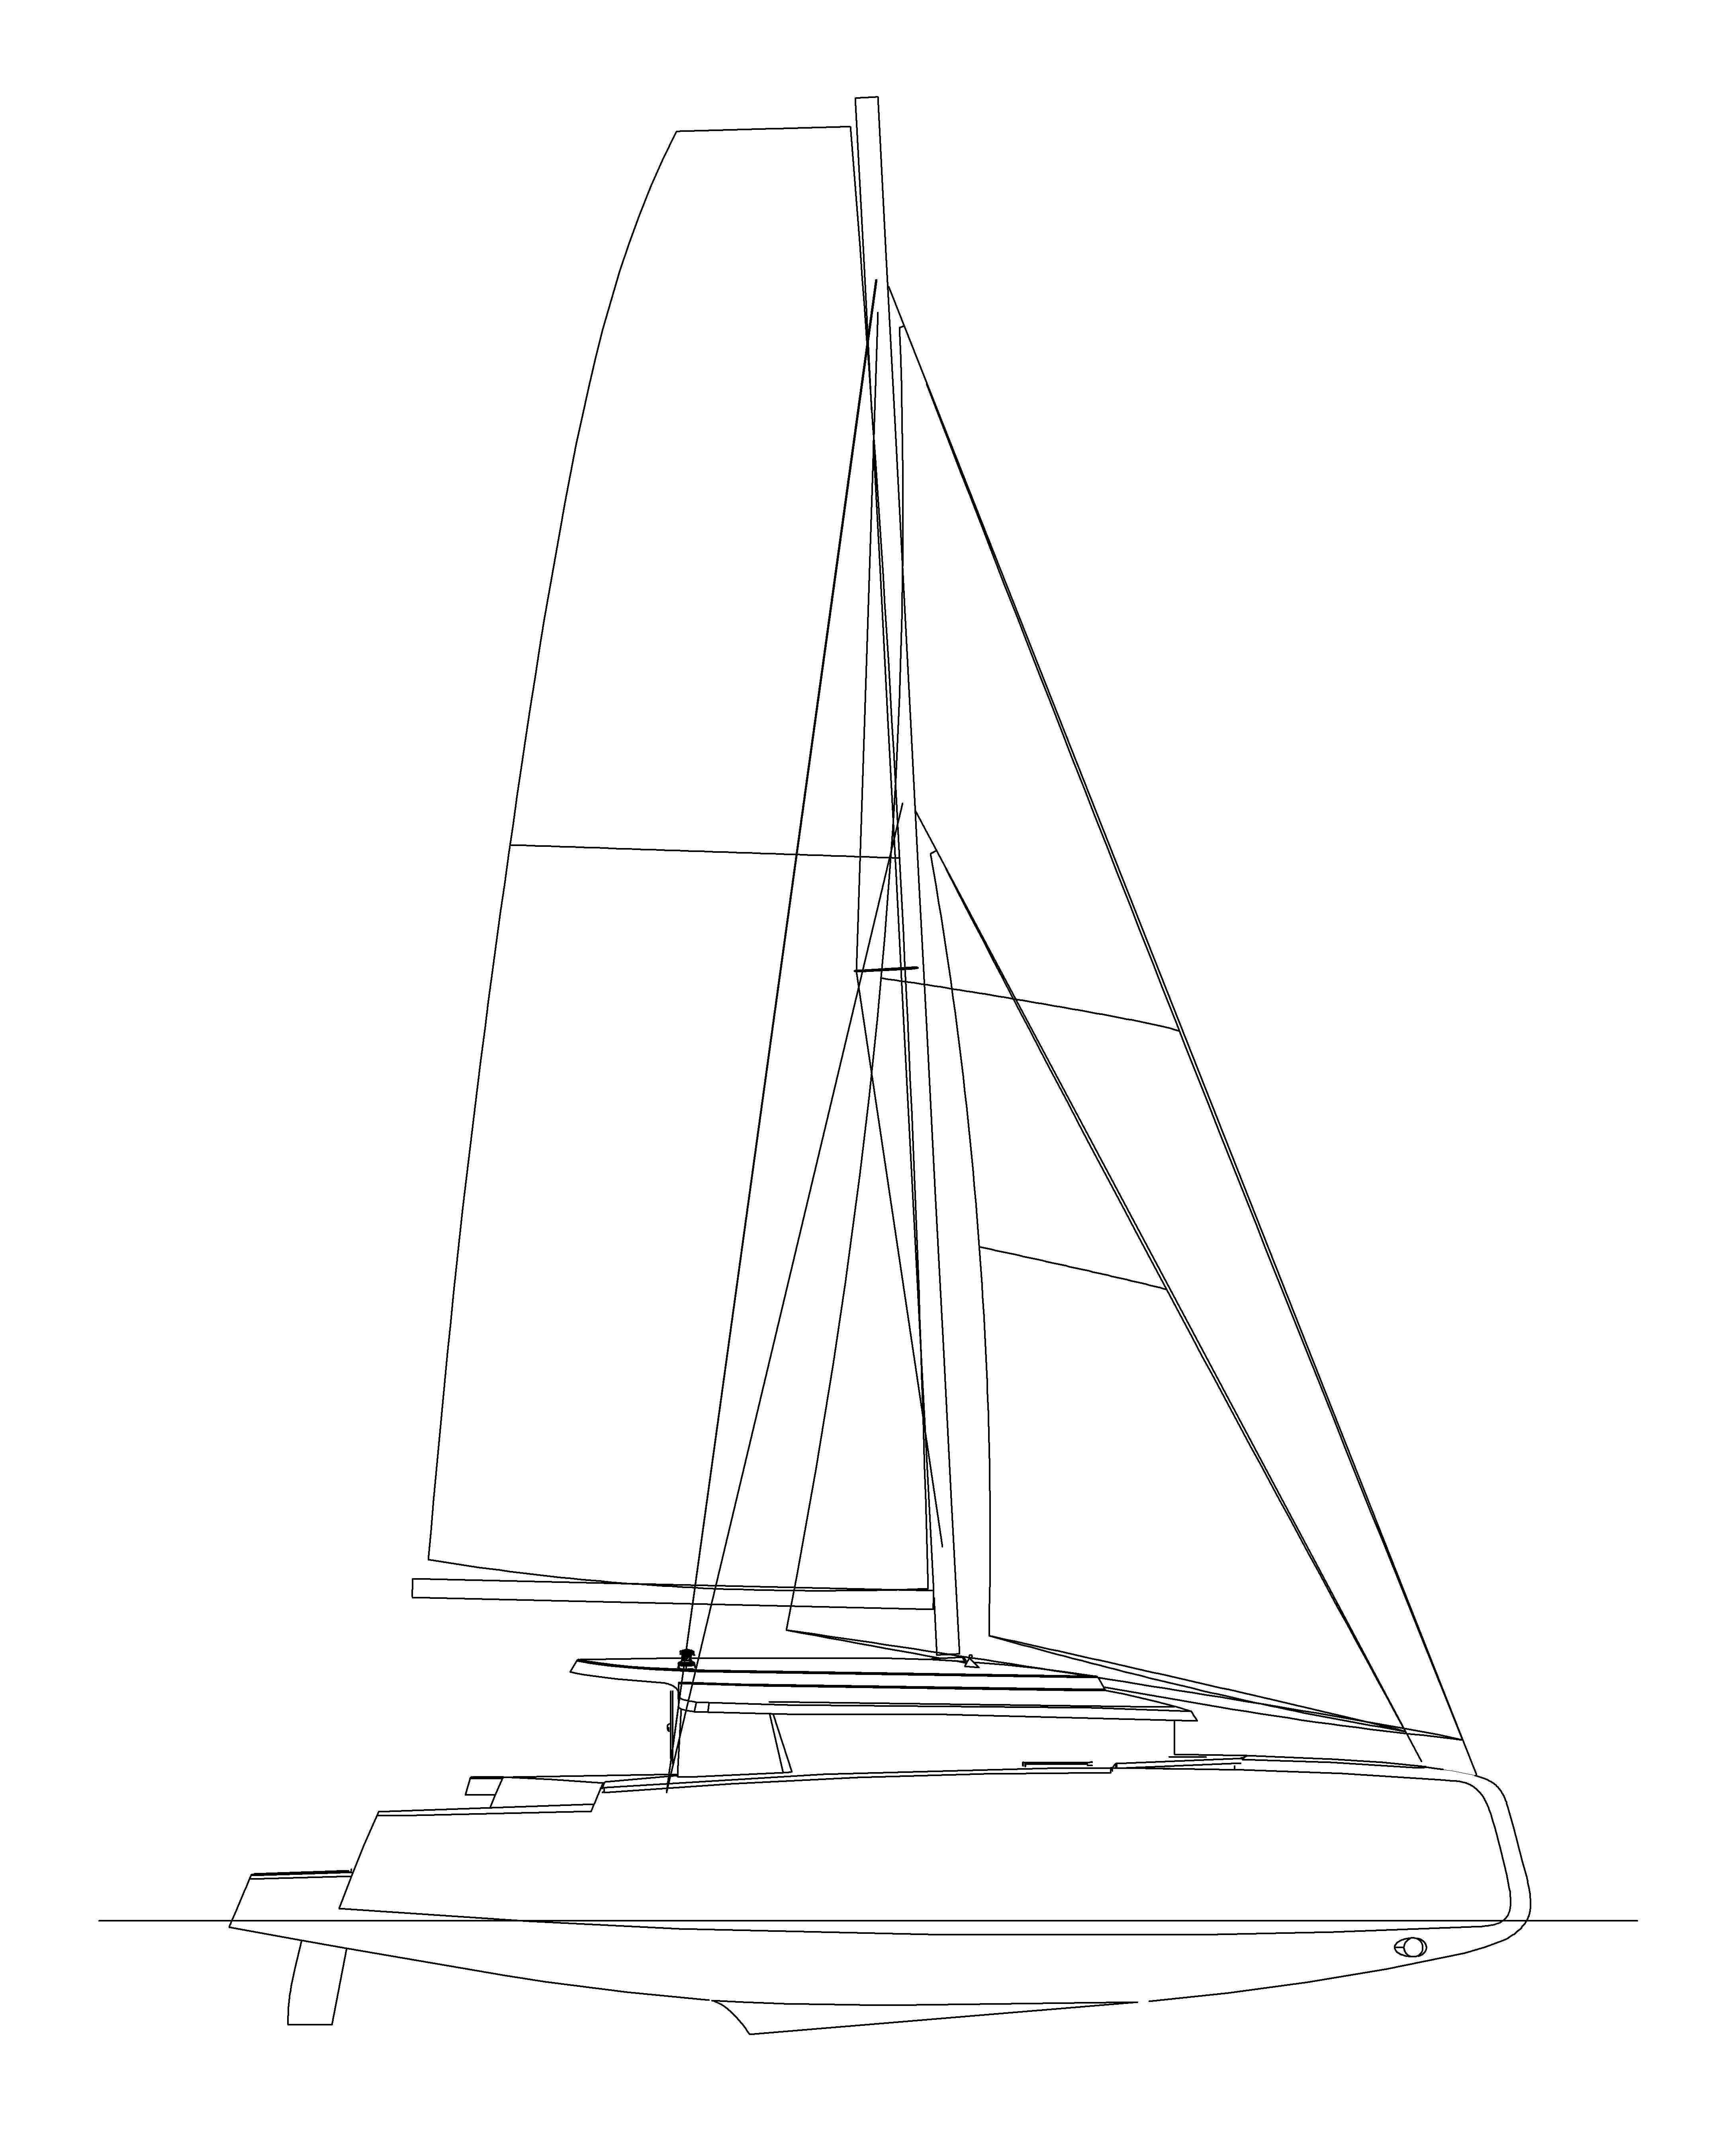 Neel 45 profile drawing